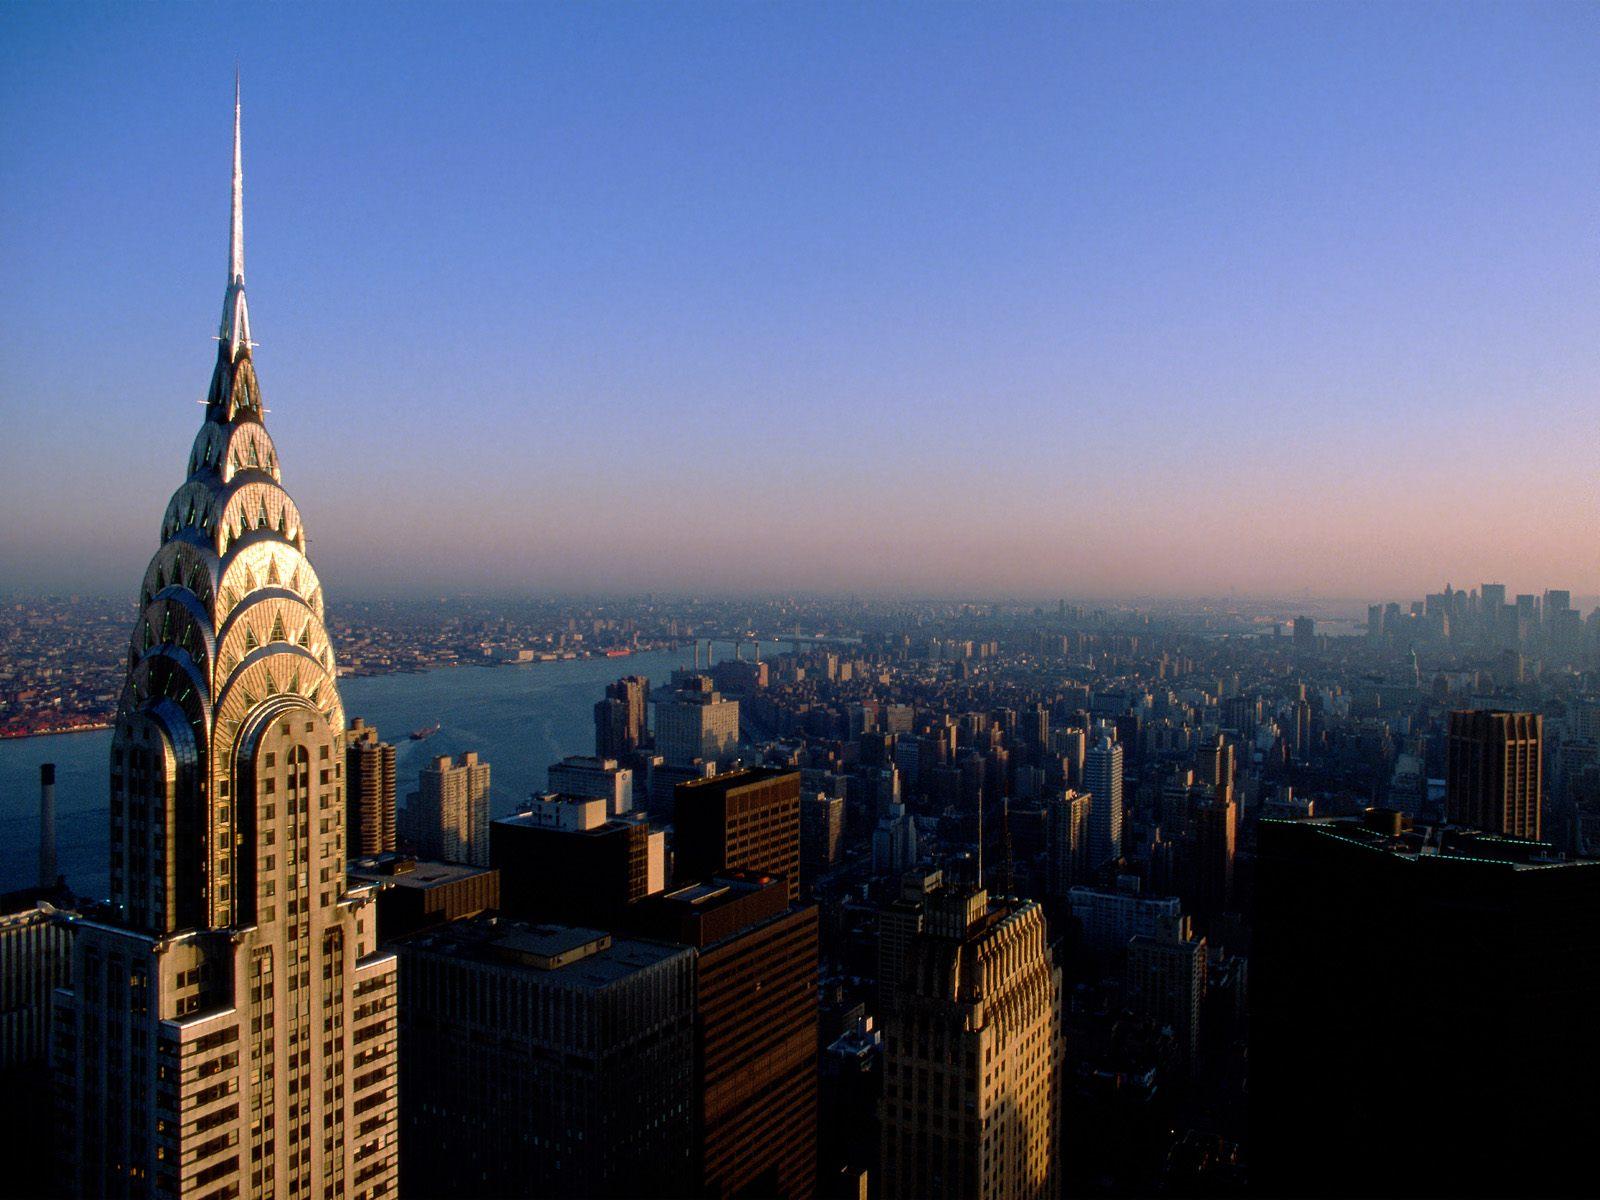 New York Duvar Katlar Download New York Masast Arka 1600x1200